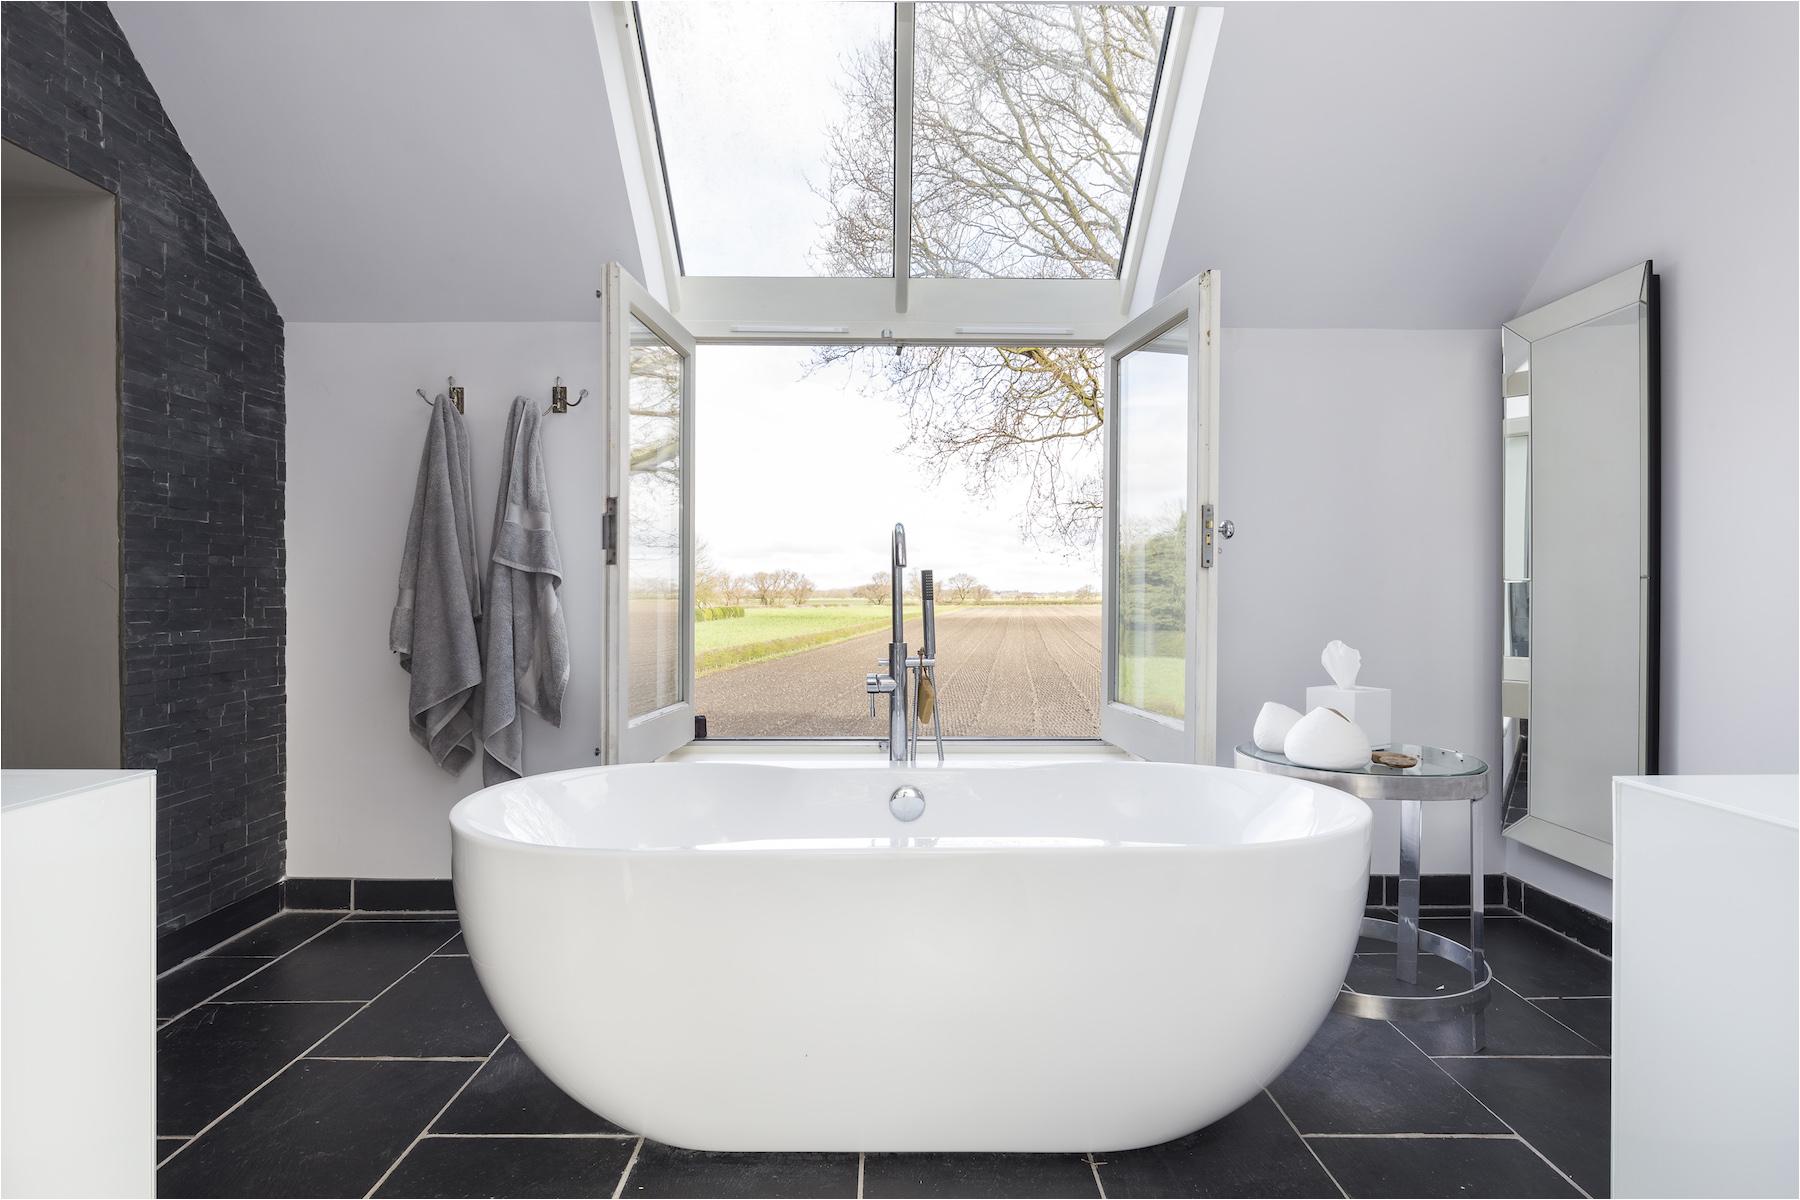 New Bathtub Designs Bathroom Design Trends Making A Surprising Eback In